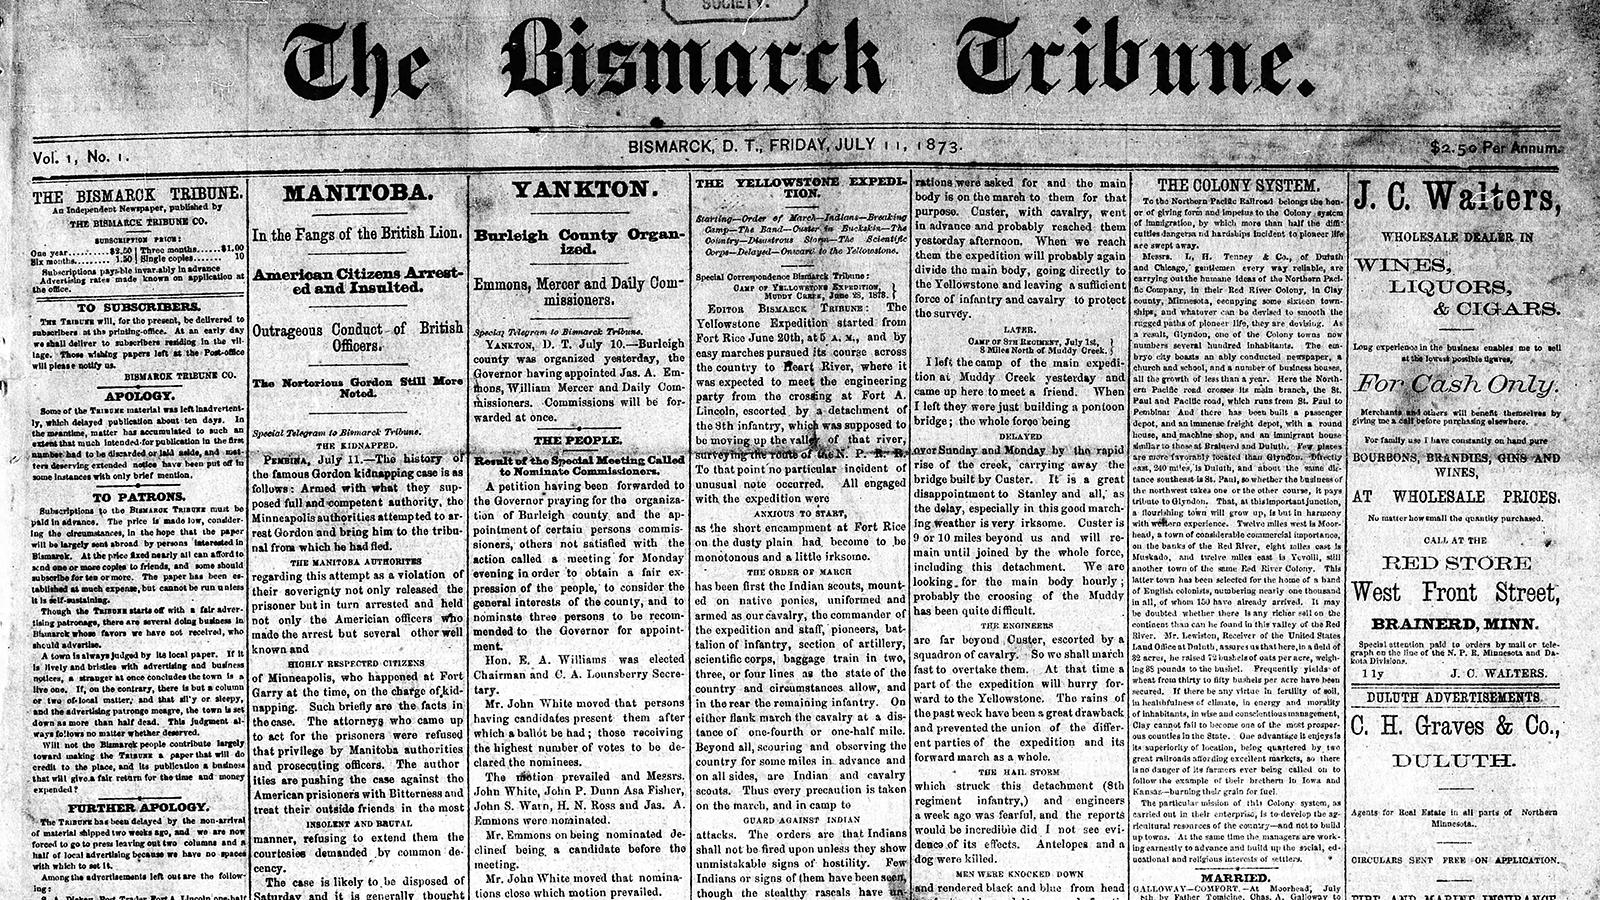 1st edition of The Bismarck Tribune, July 11, 1873